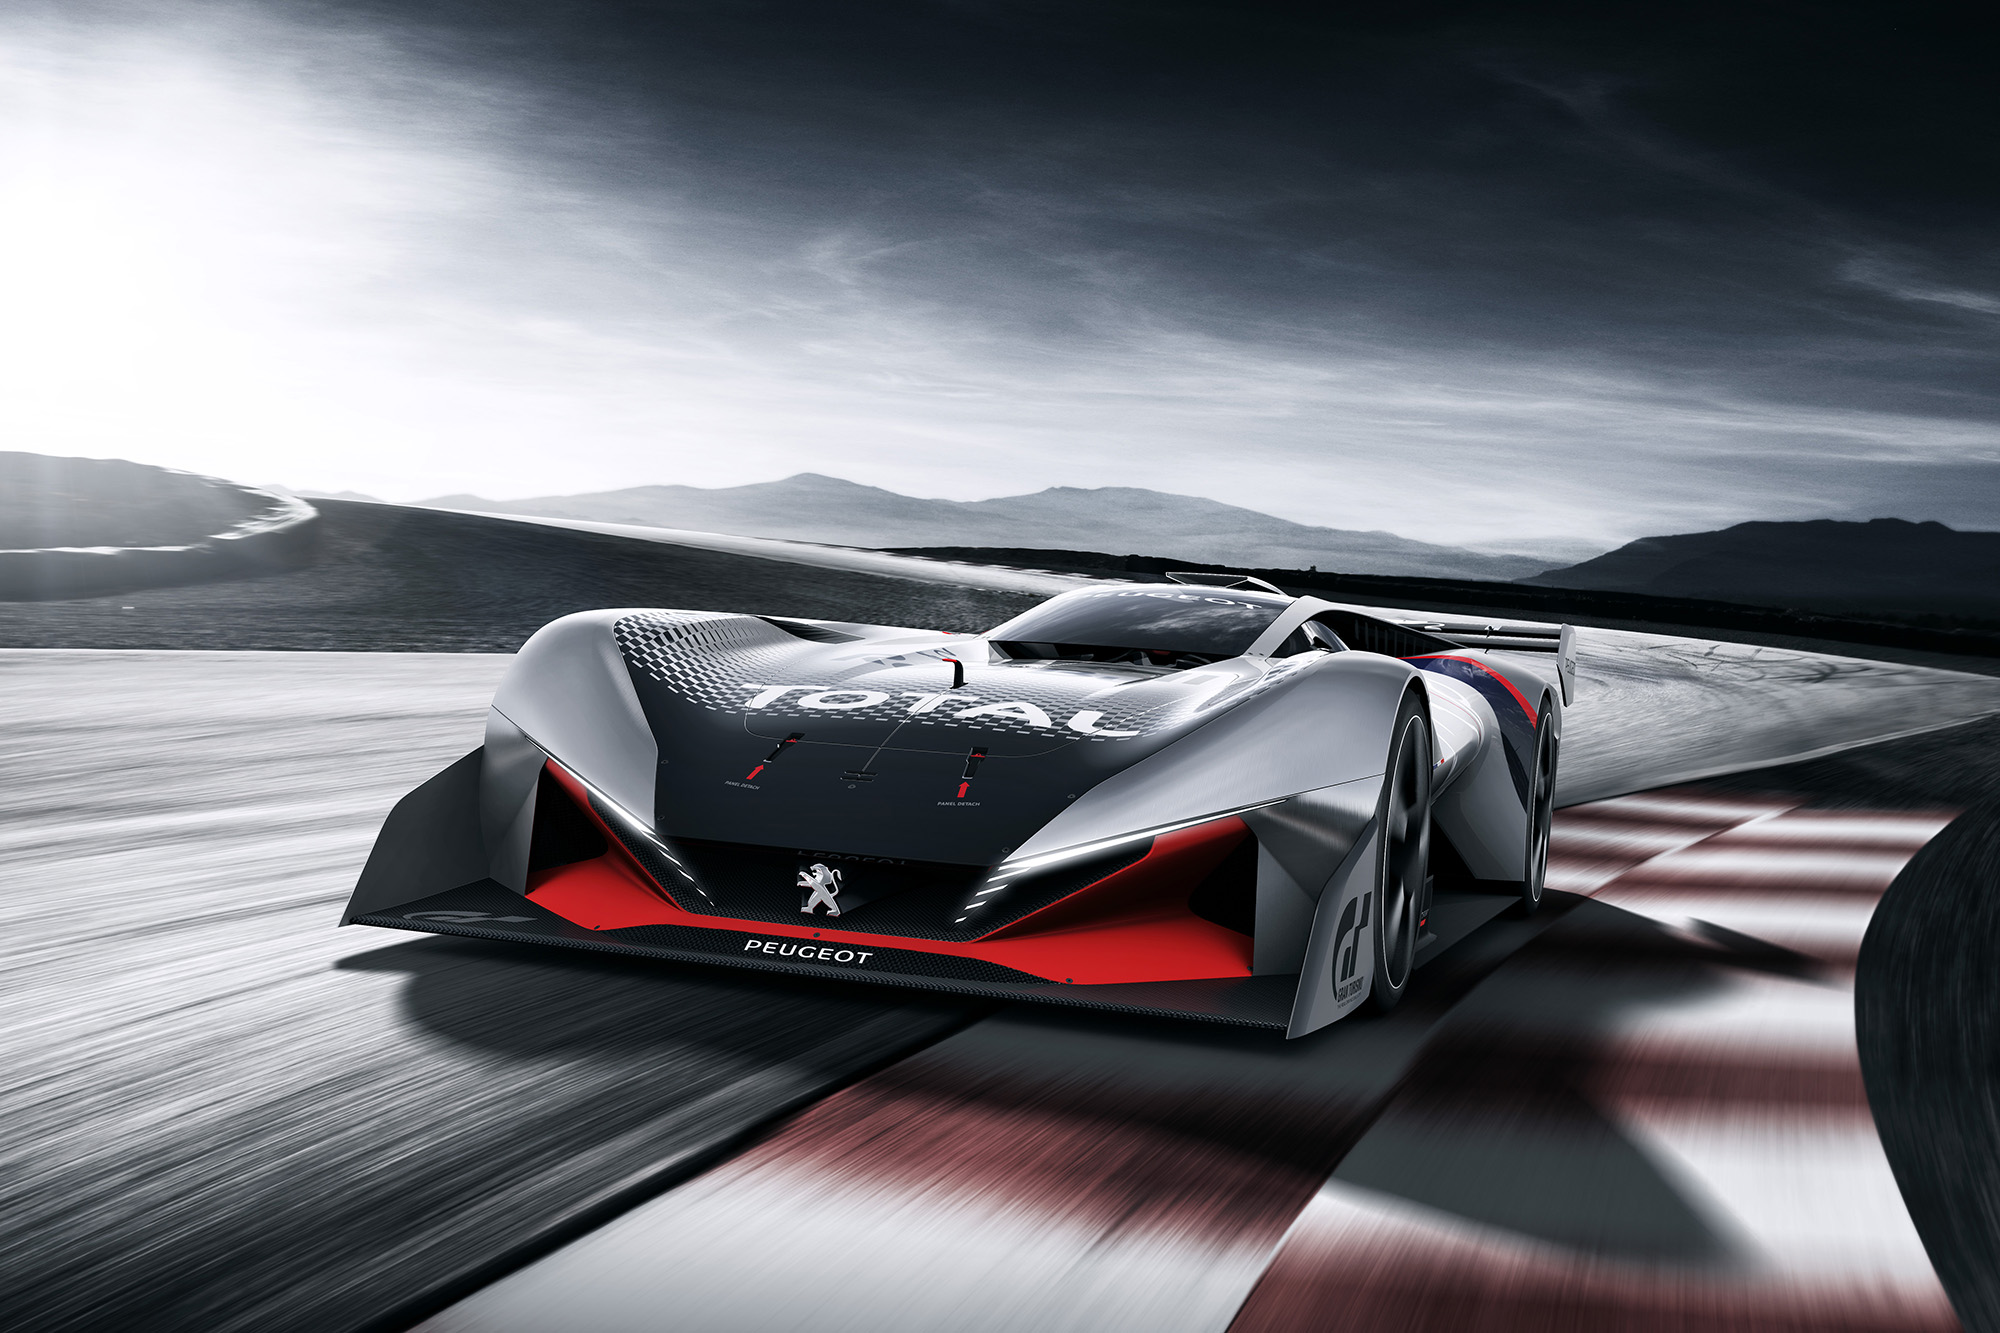 Peugeot reveals L750 R Hybrid Vision Gran Turismo racing car concept